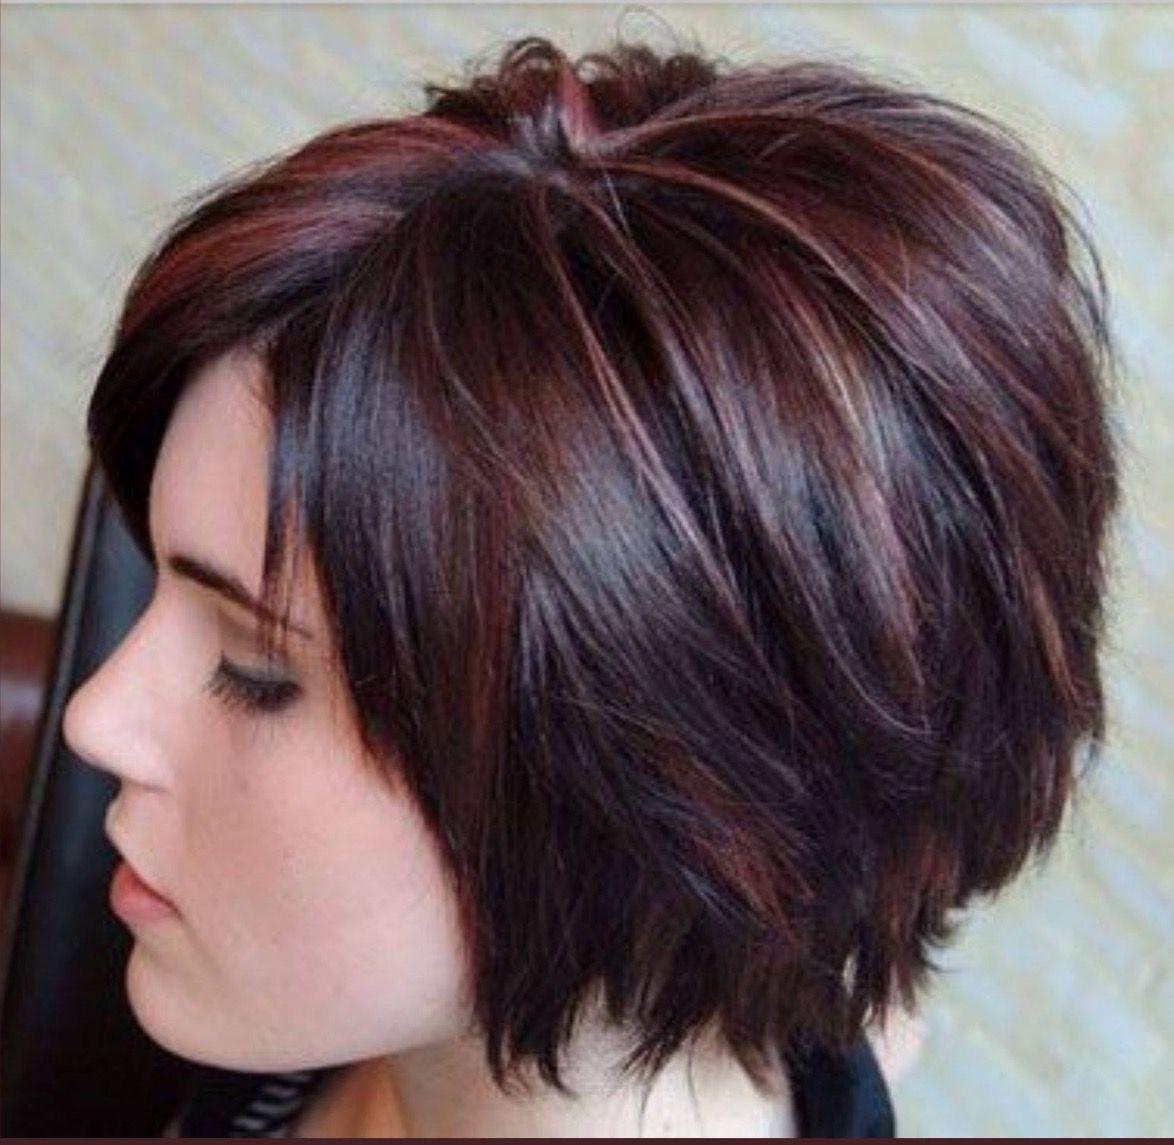 Pin by lynn odle on hair ideas for thick hair pinterest hair